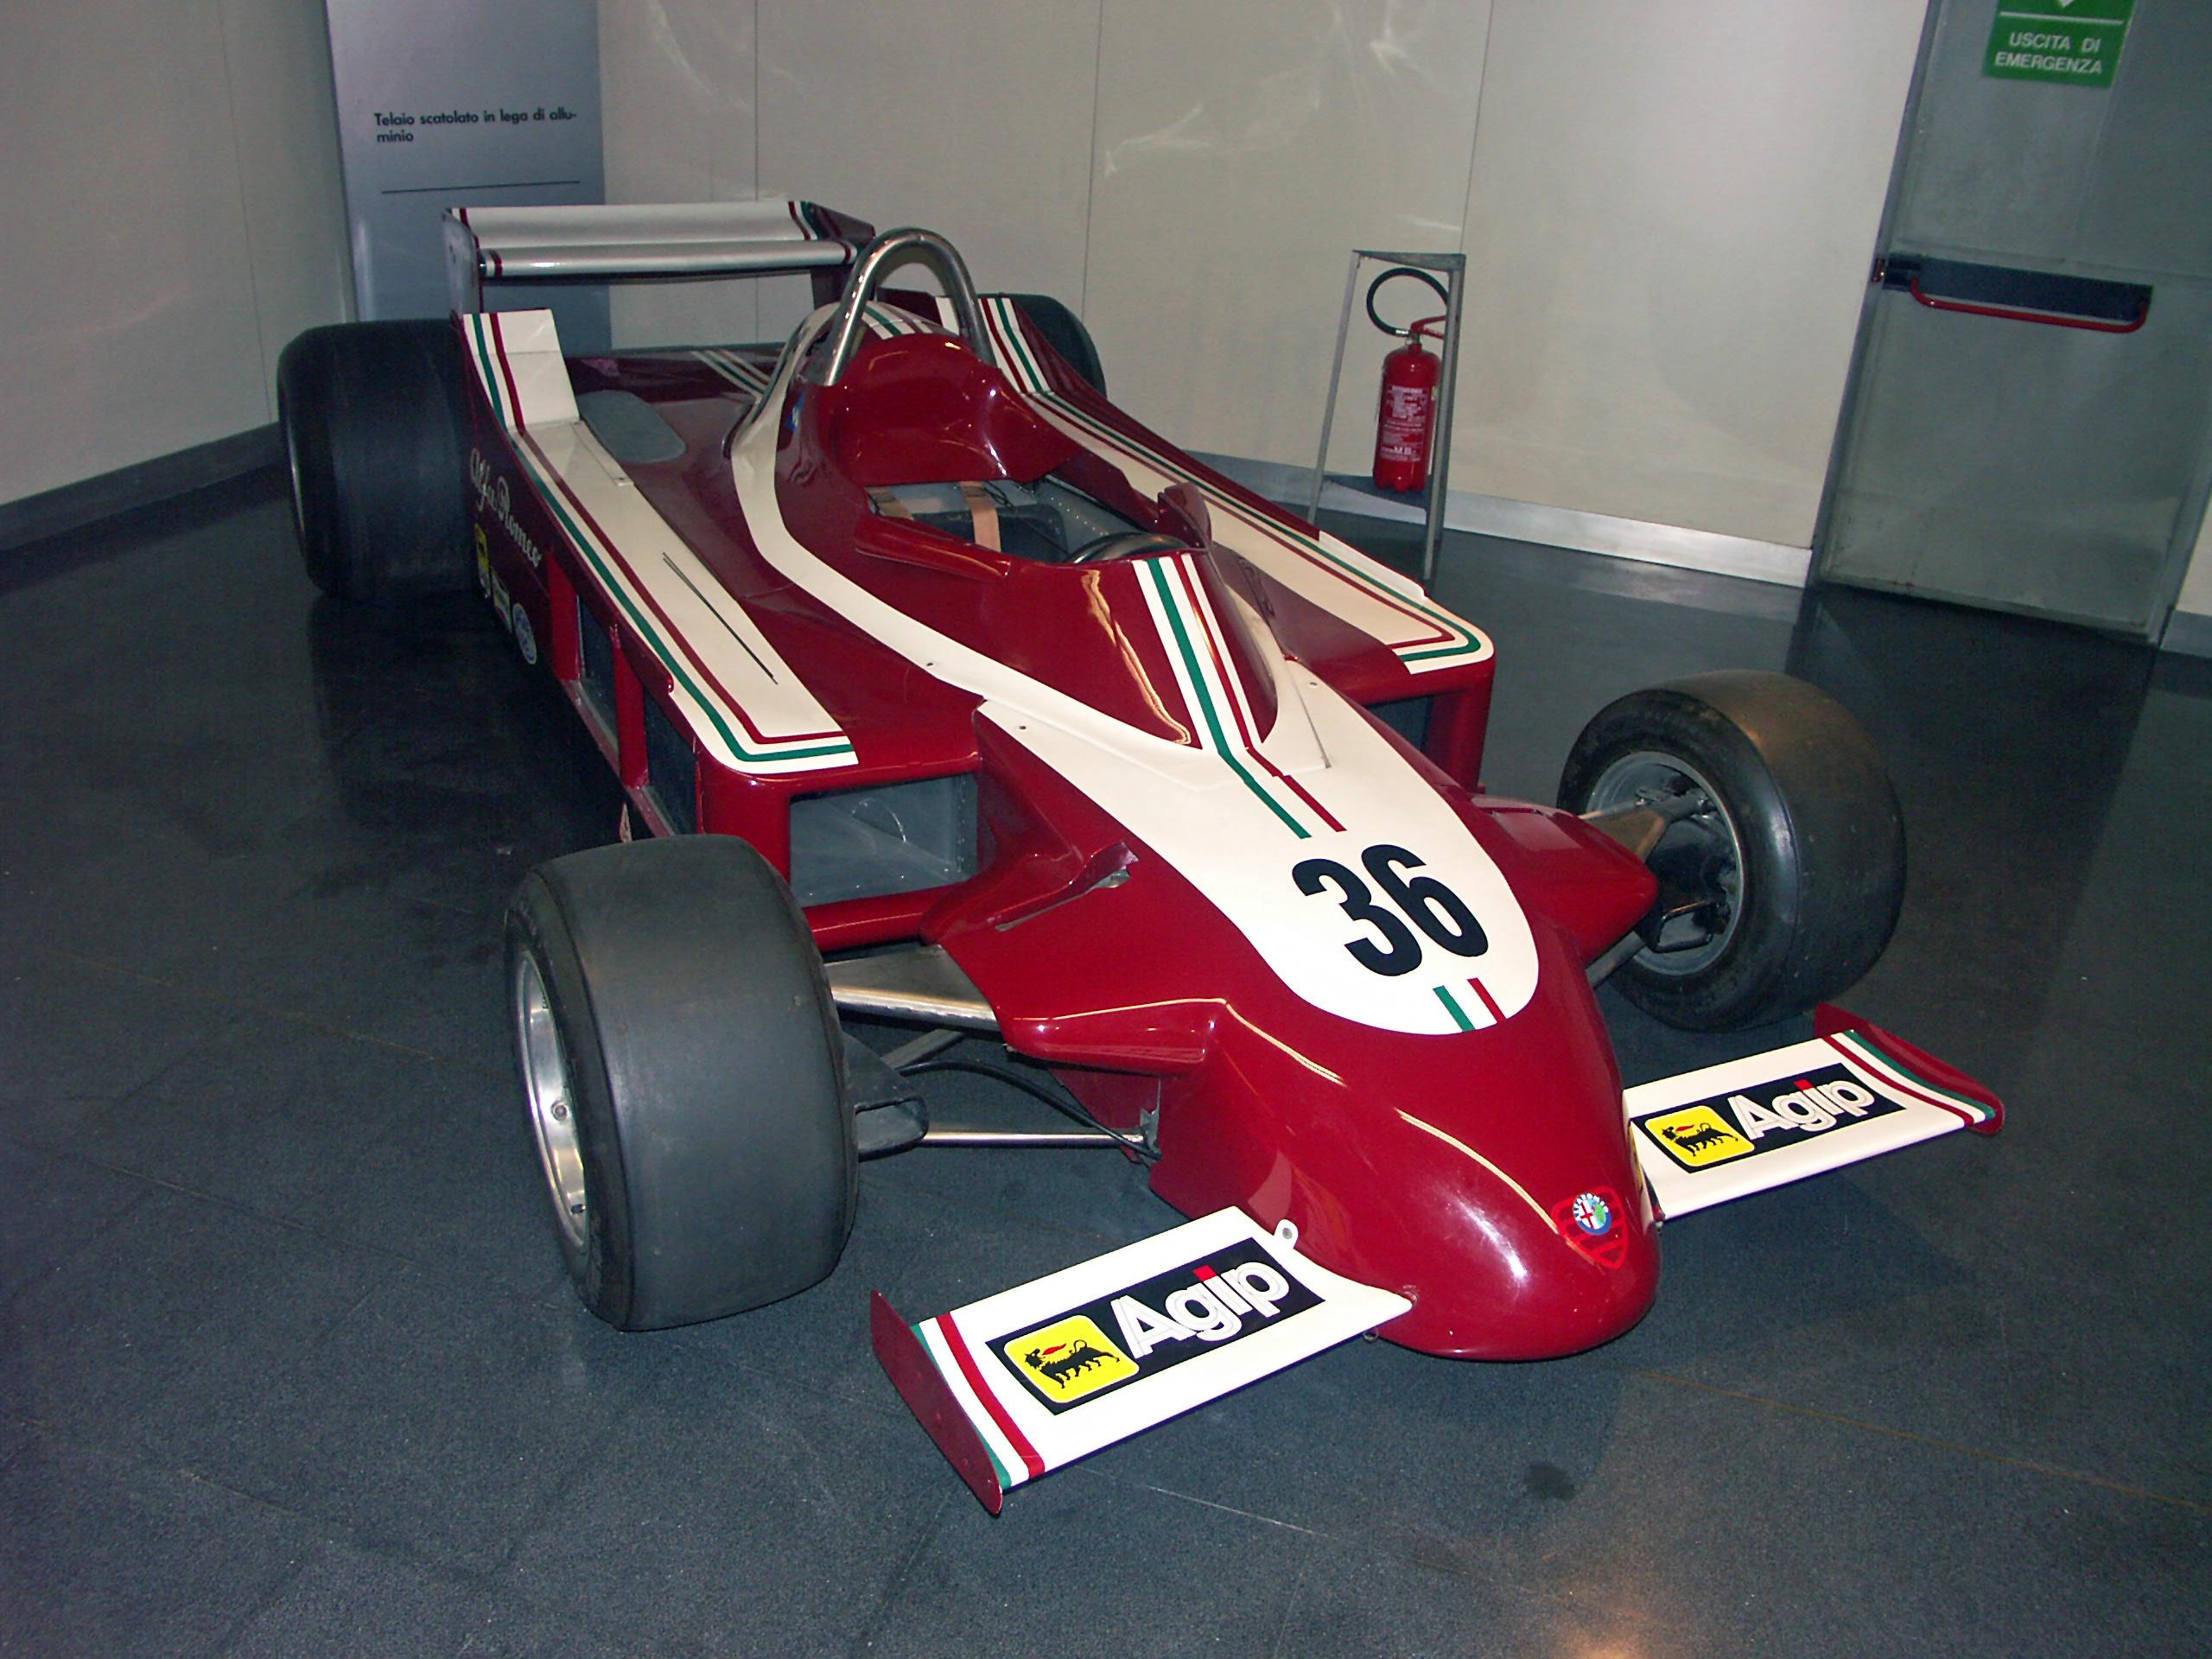 Alfa_Romeo_177_in_Museo_Storico_Alfa_Rom